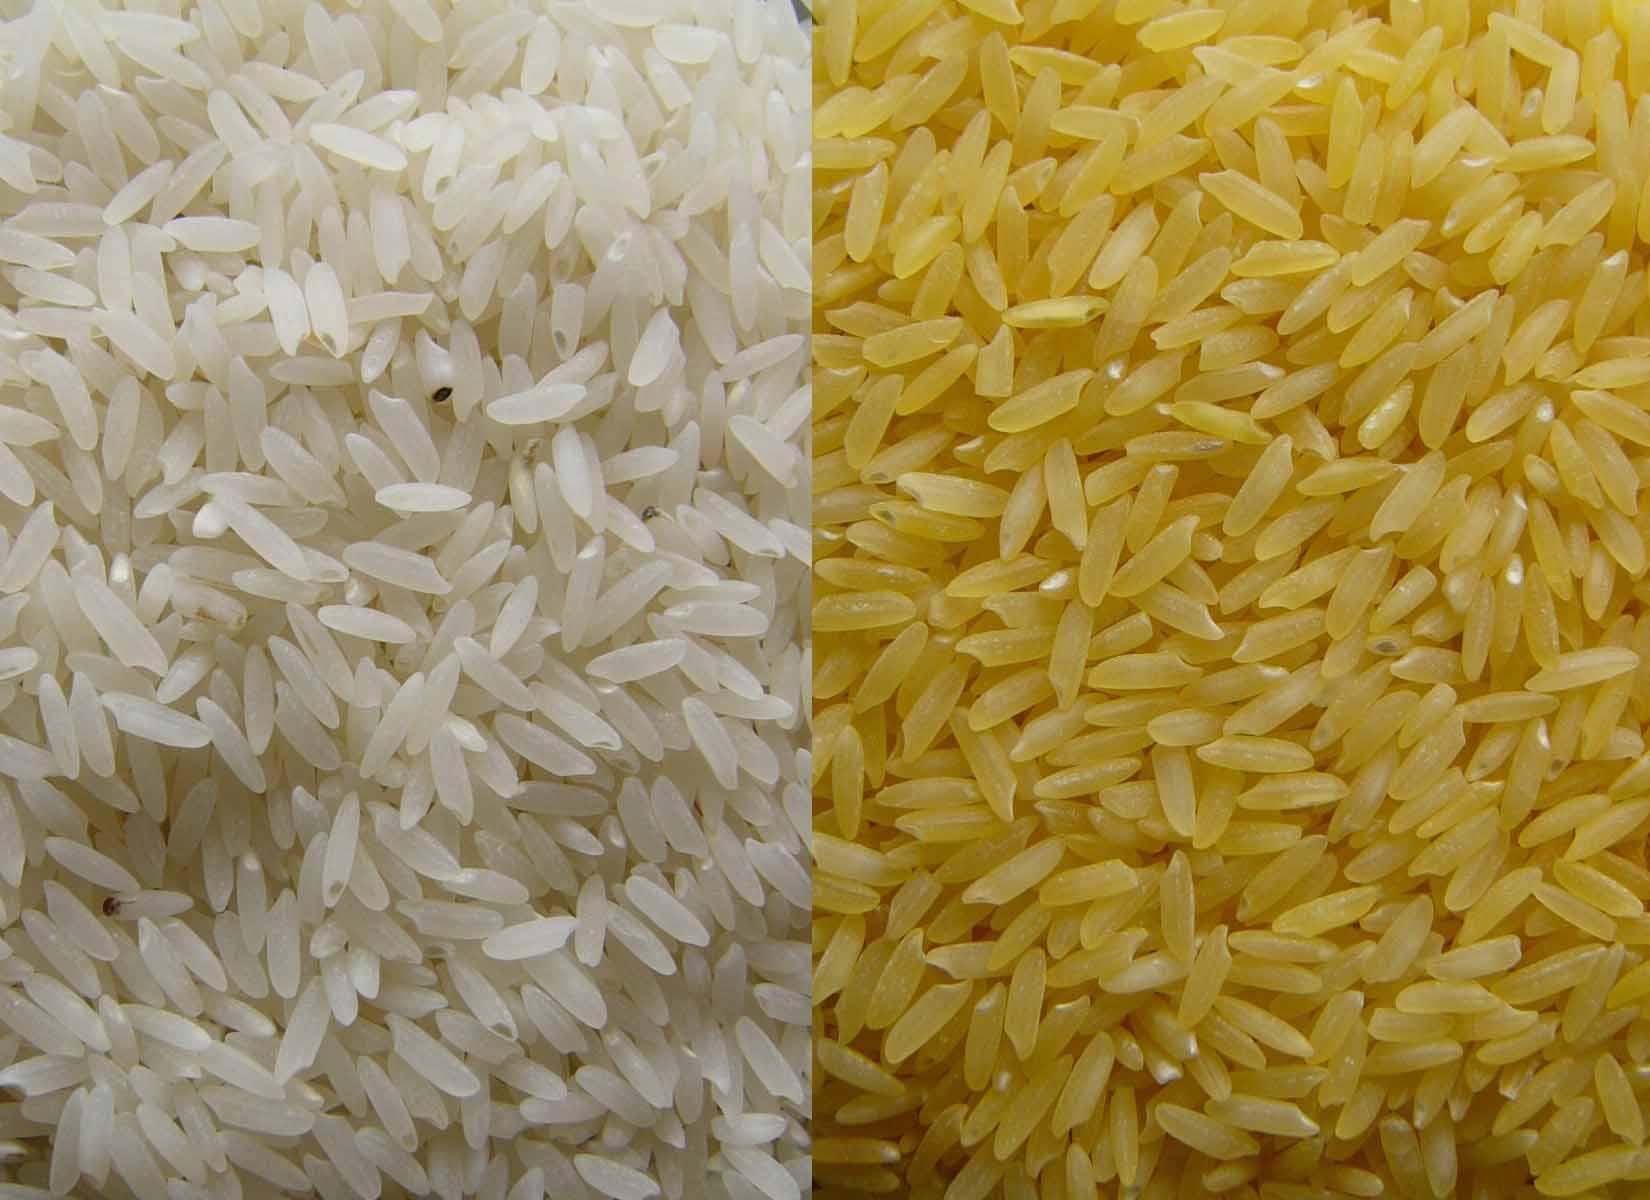 Which rice do you prefer?